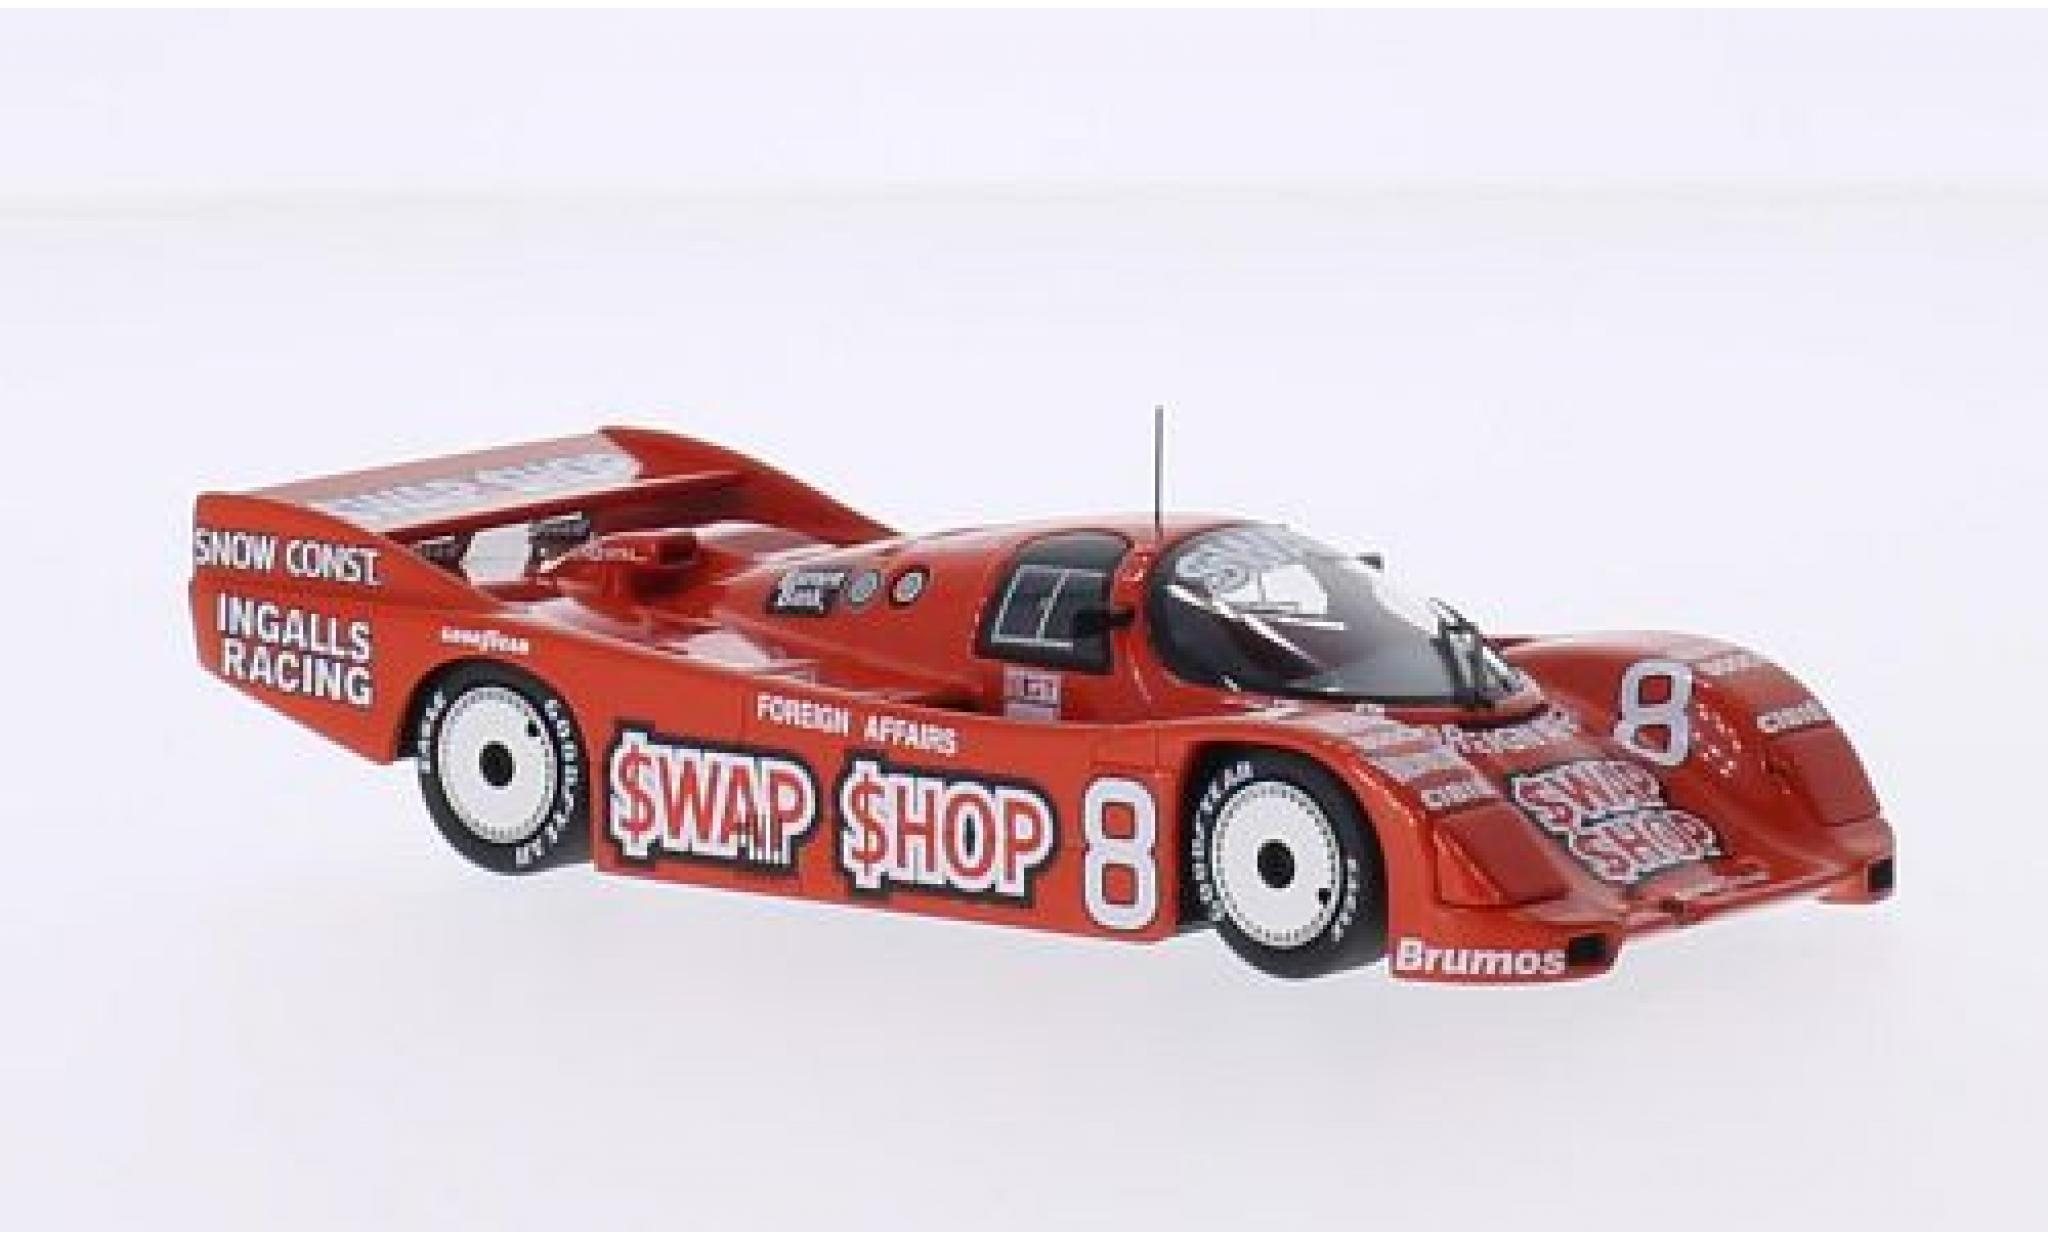 Porsche 962 1985 1/43 Minichamps IMSA No.8 Ingalls Racing Swap Shop IMSA 12h Sebring A.J.Foyt/B.Wollek